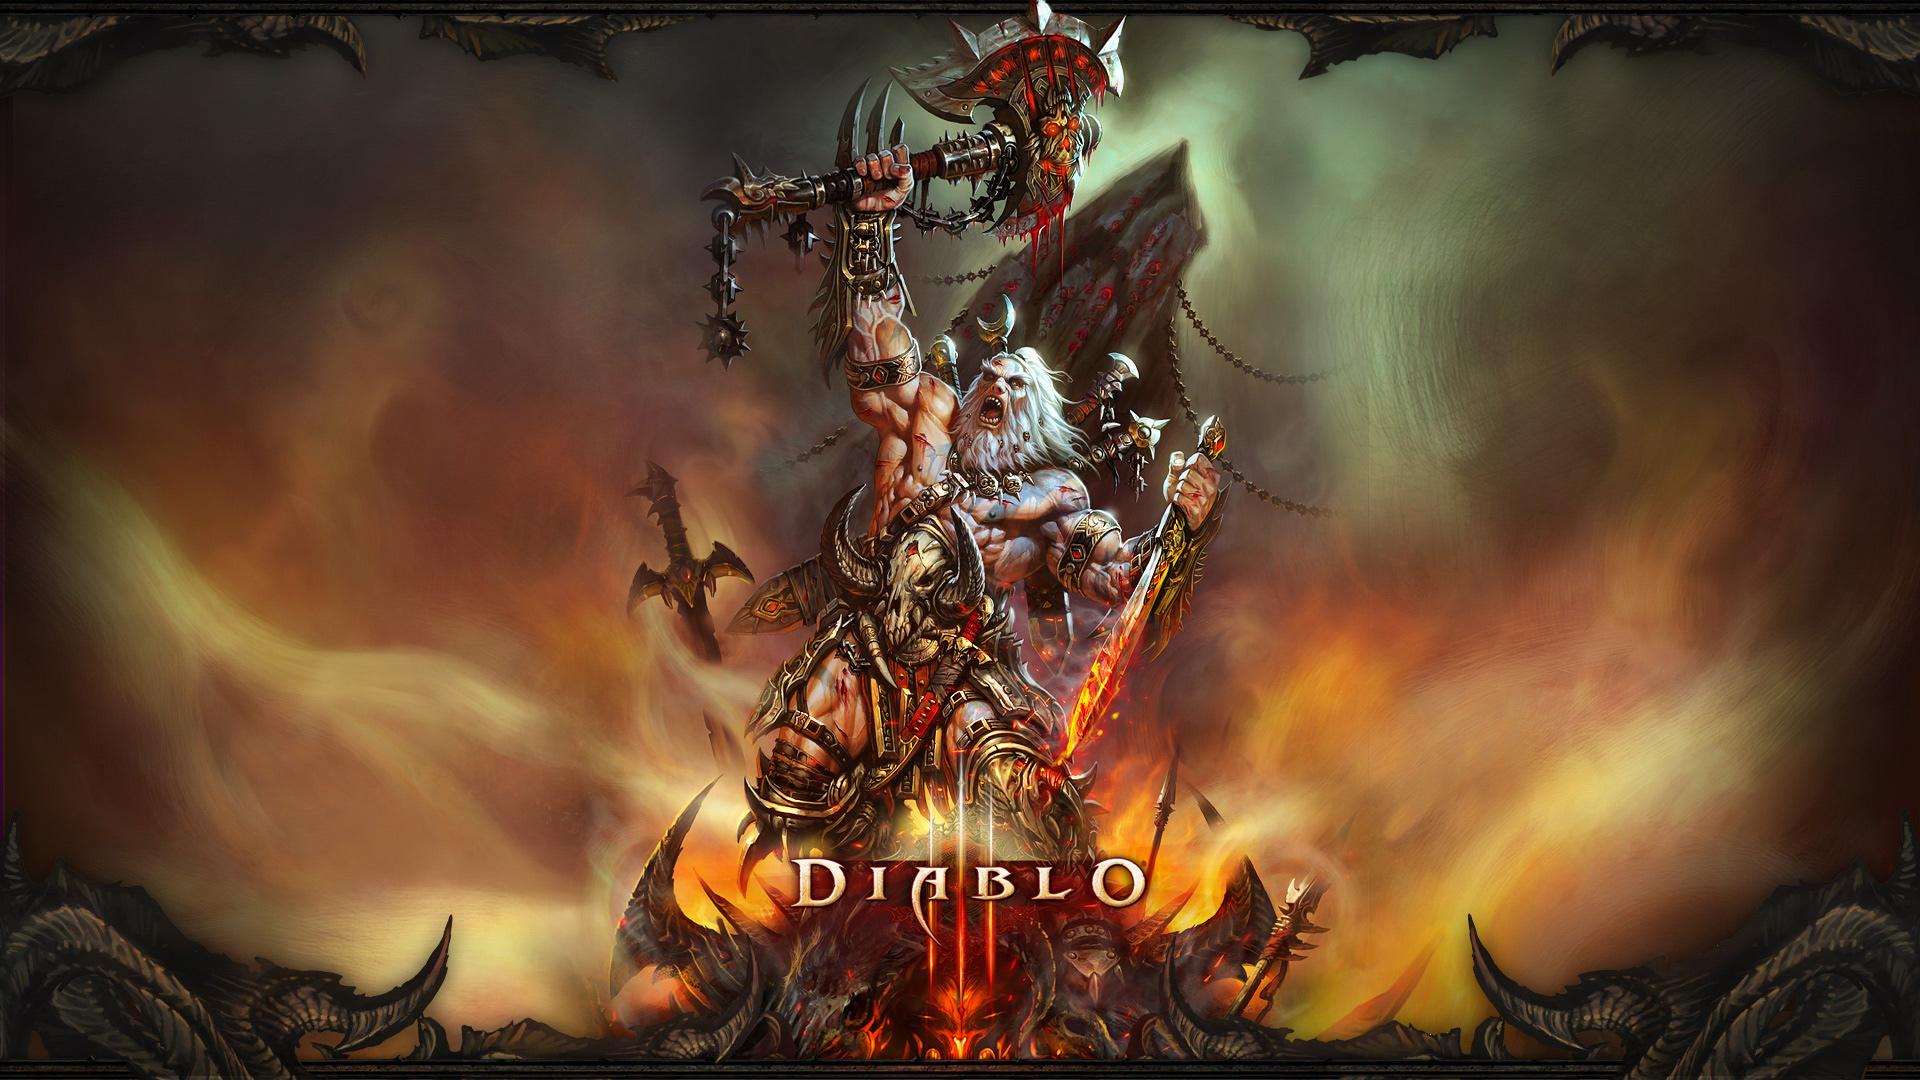 Diablo 3 Wizard Wallpaper 1920x1080 Images amp Pictures   Becuo 1920x1080